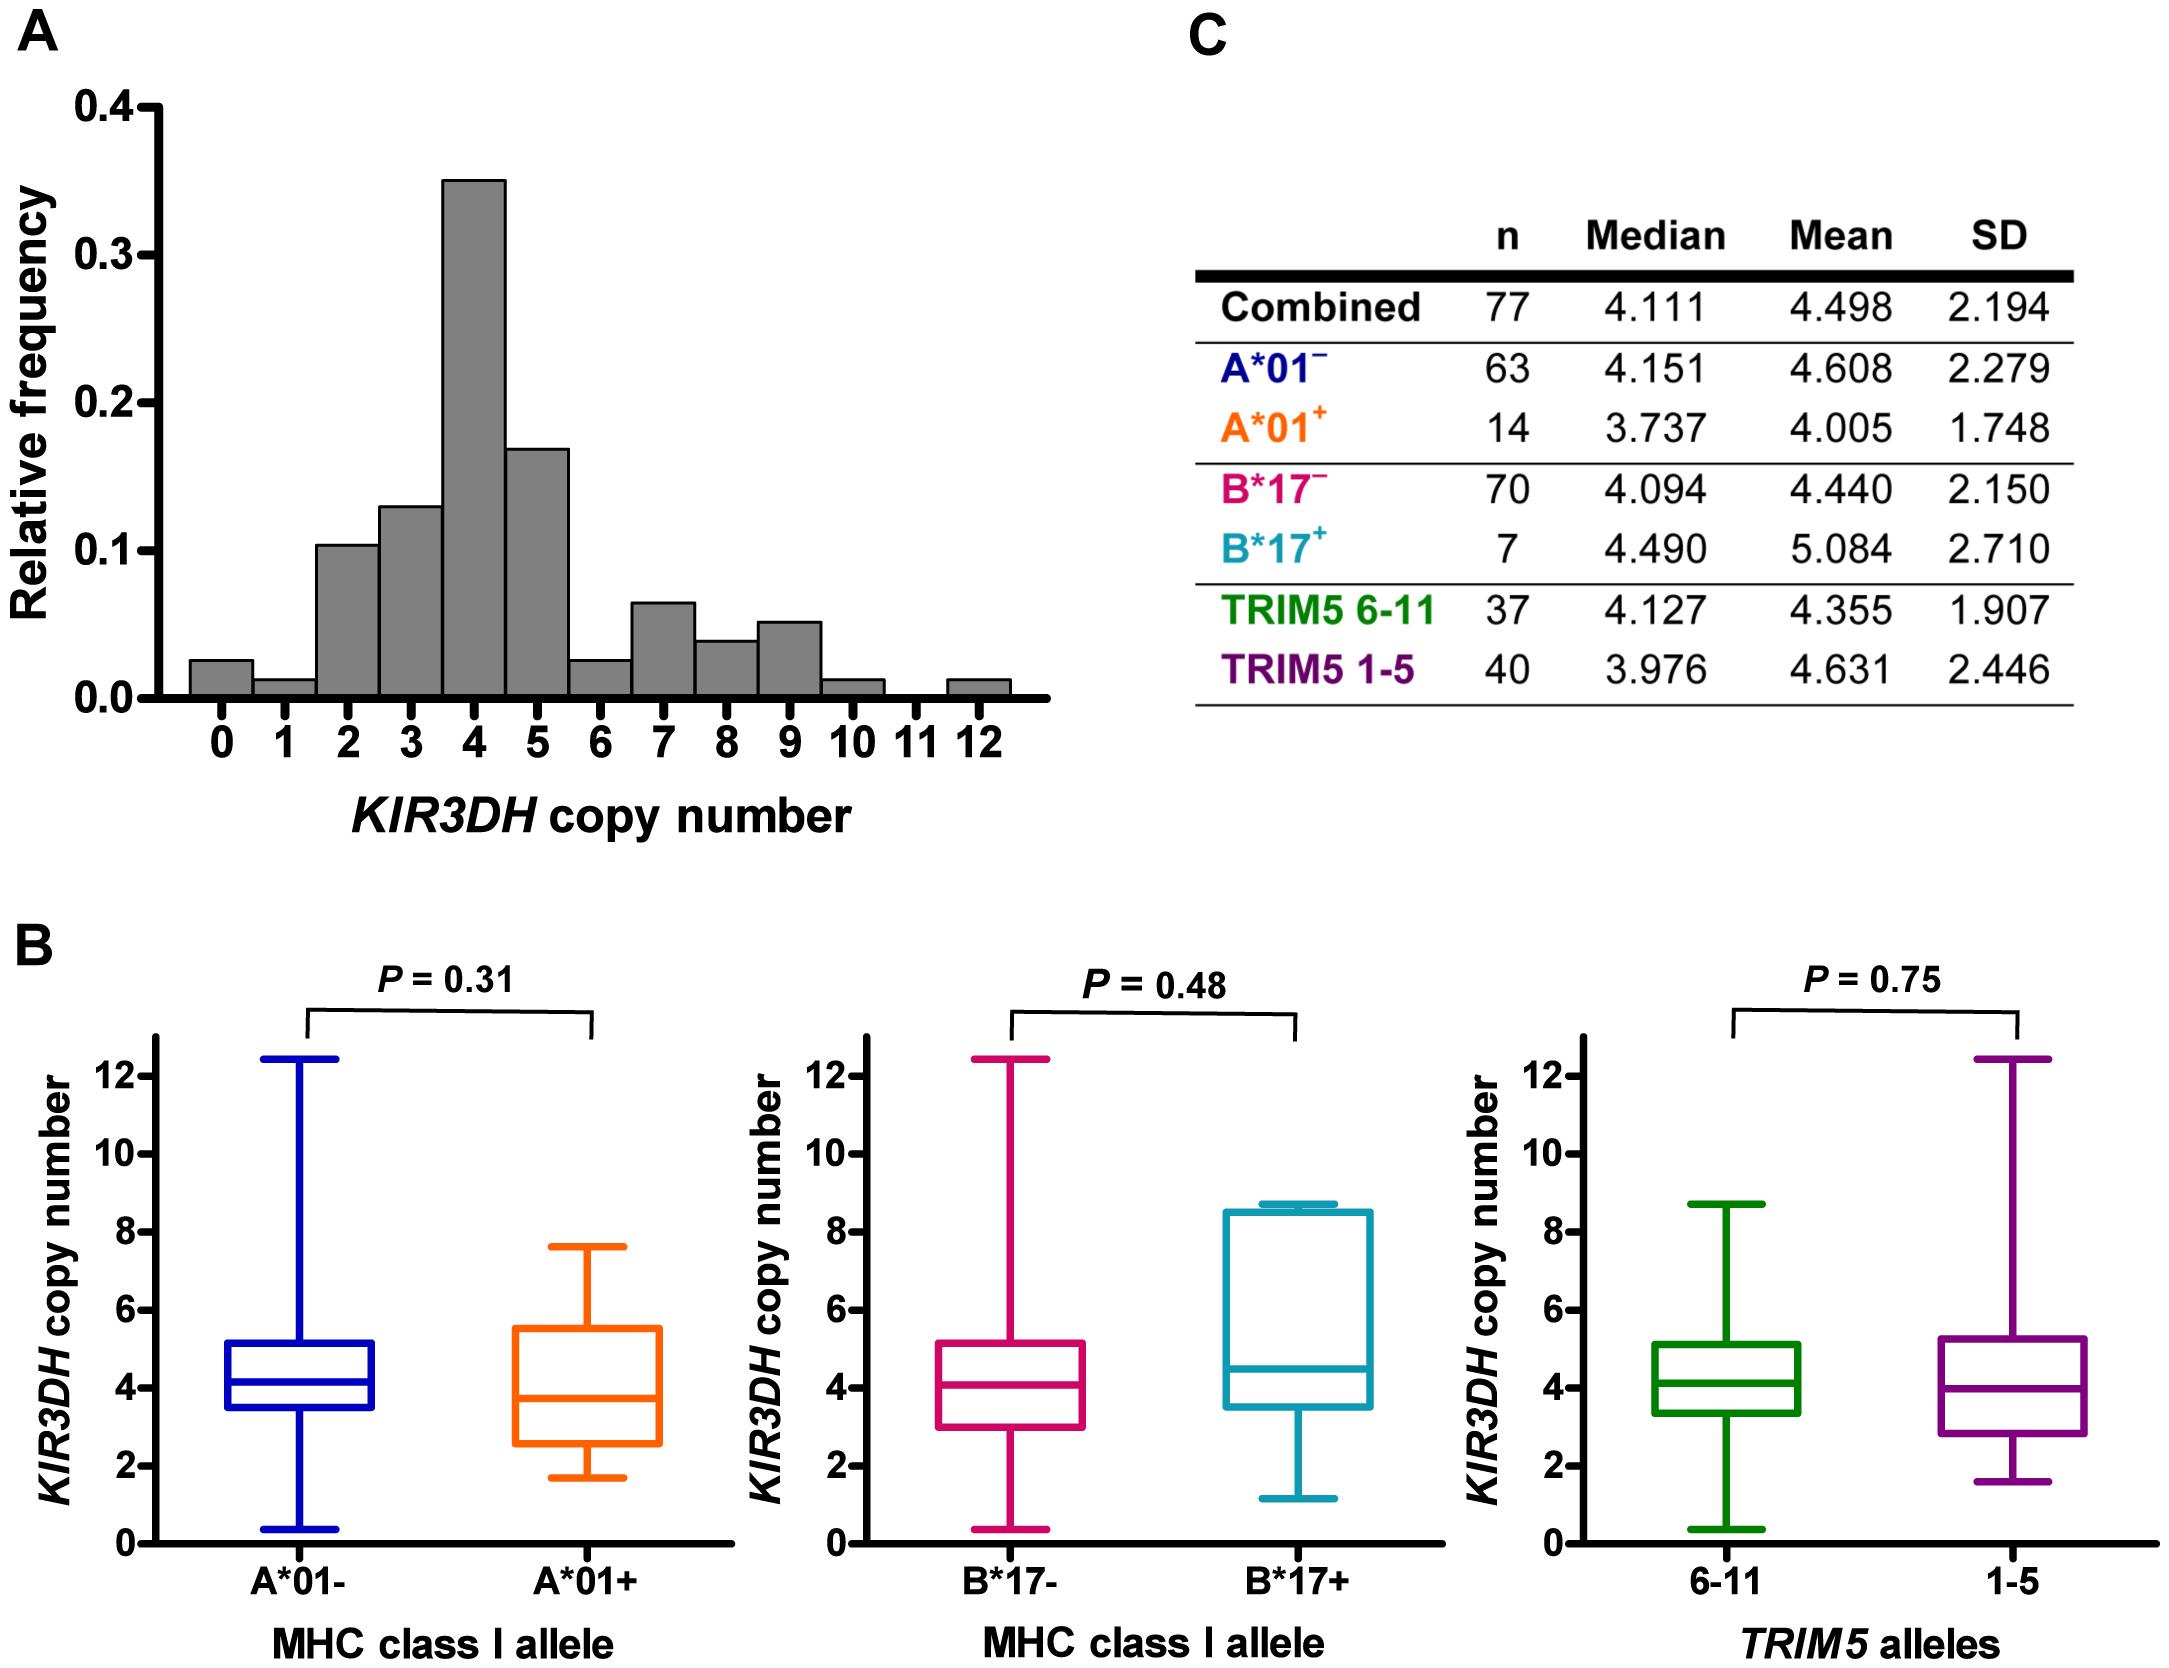 Distribution of <i>KIR3DH</i> copy numbers in Indian-origin rhesus monkeys.